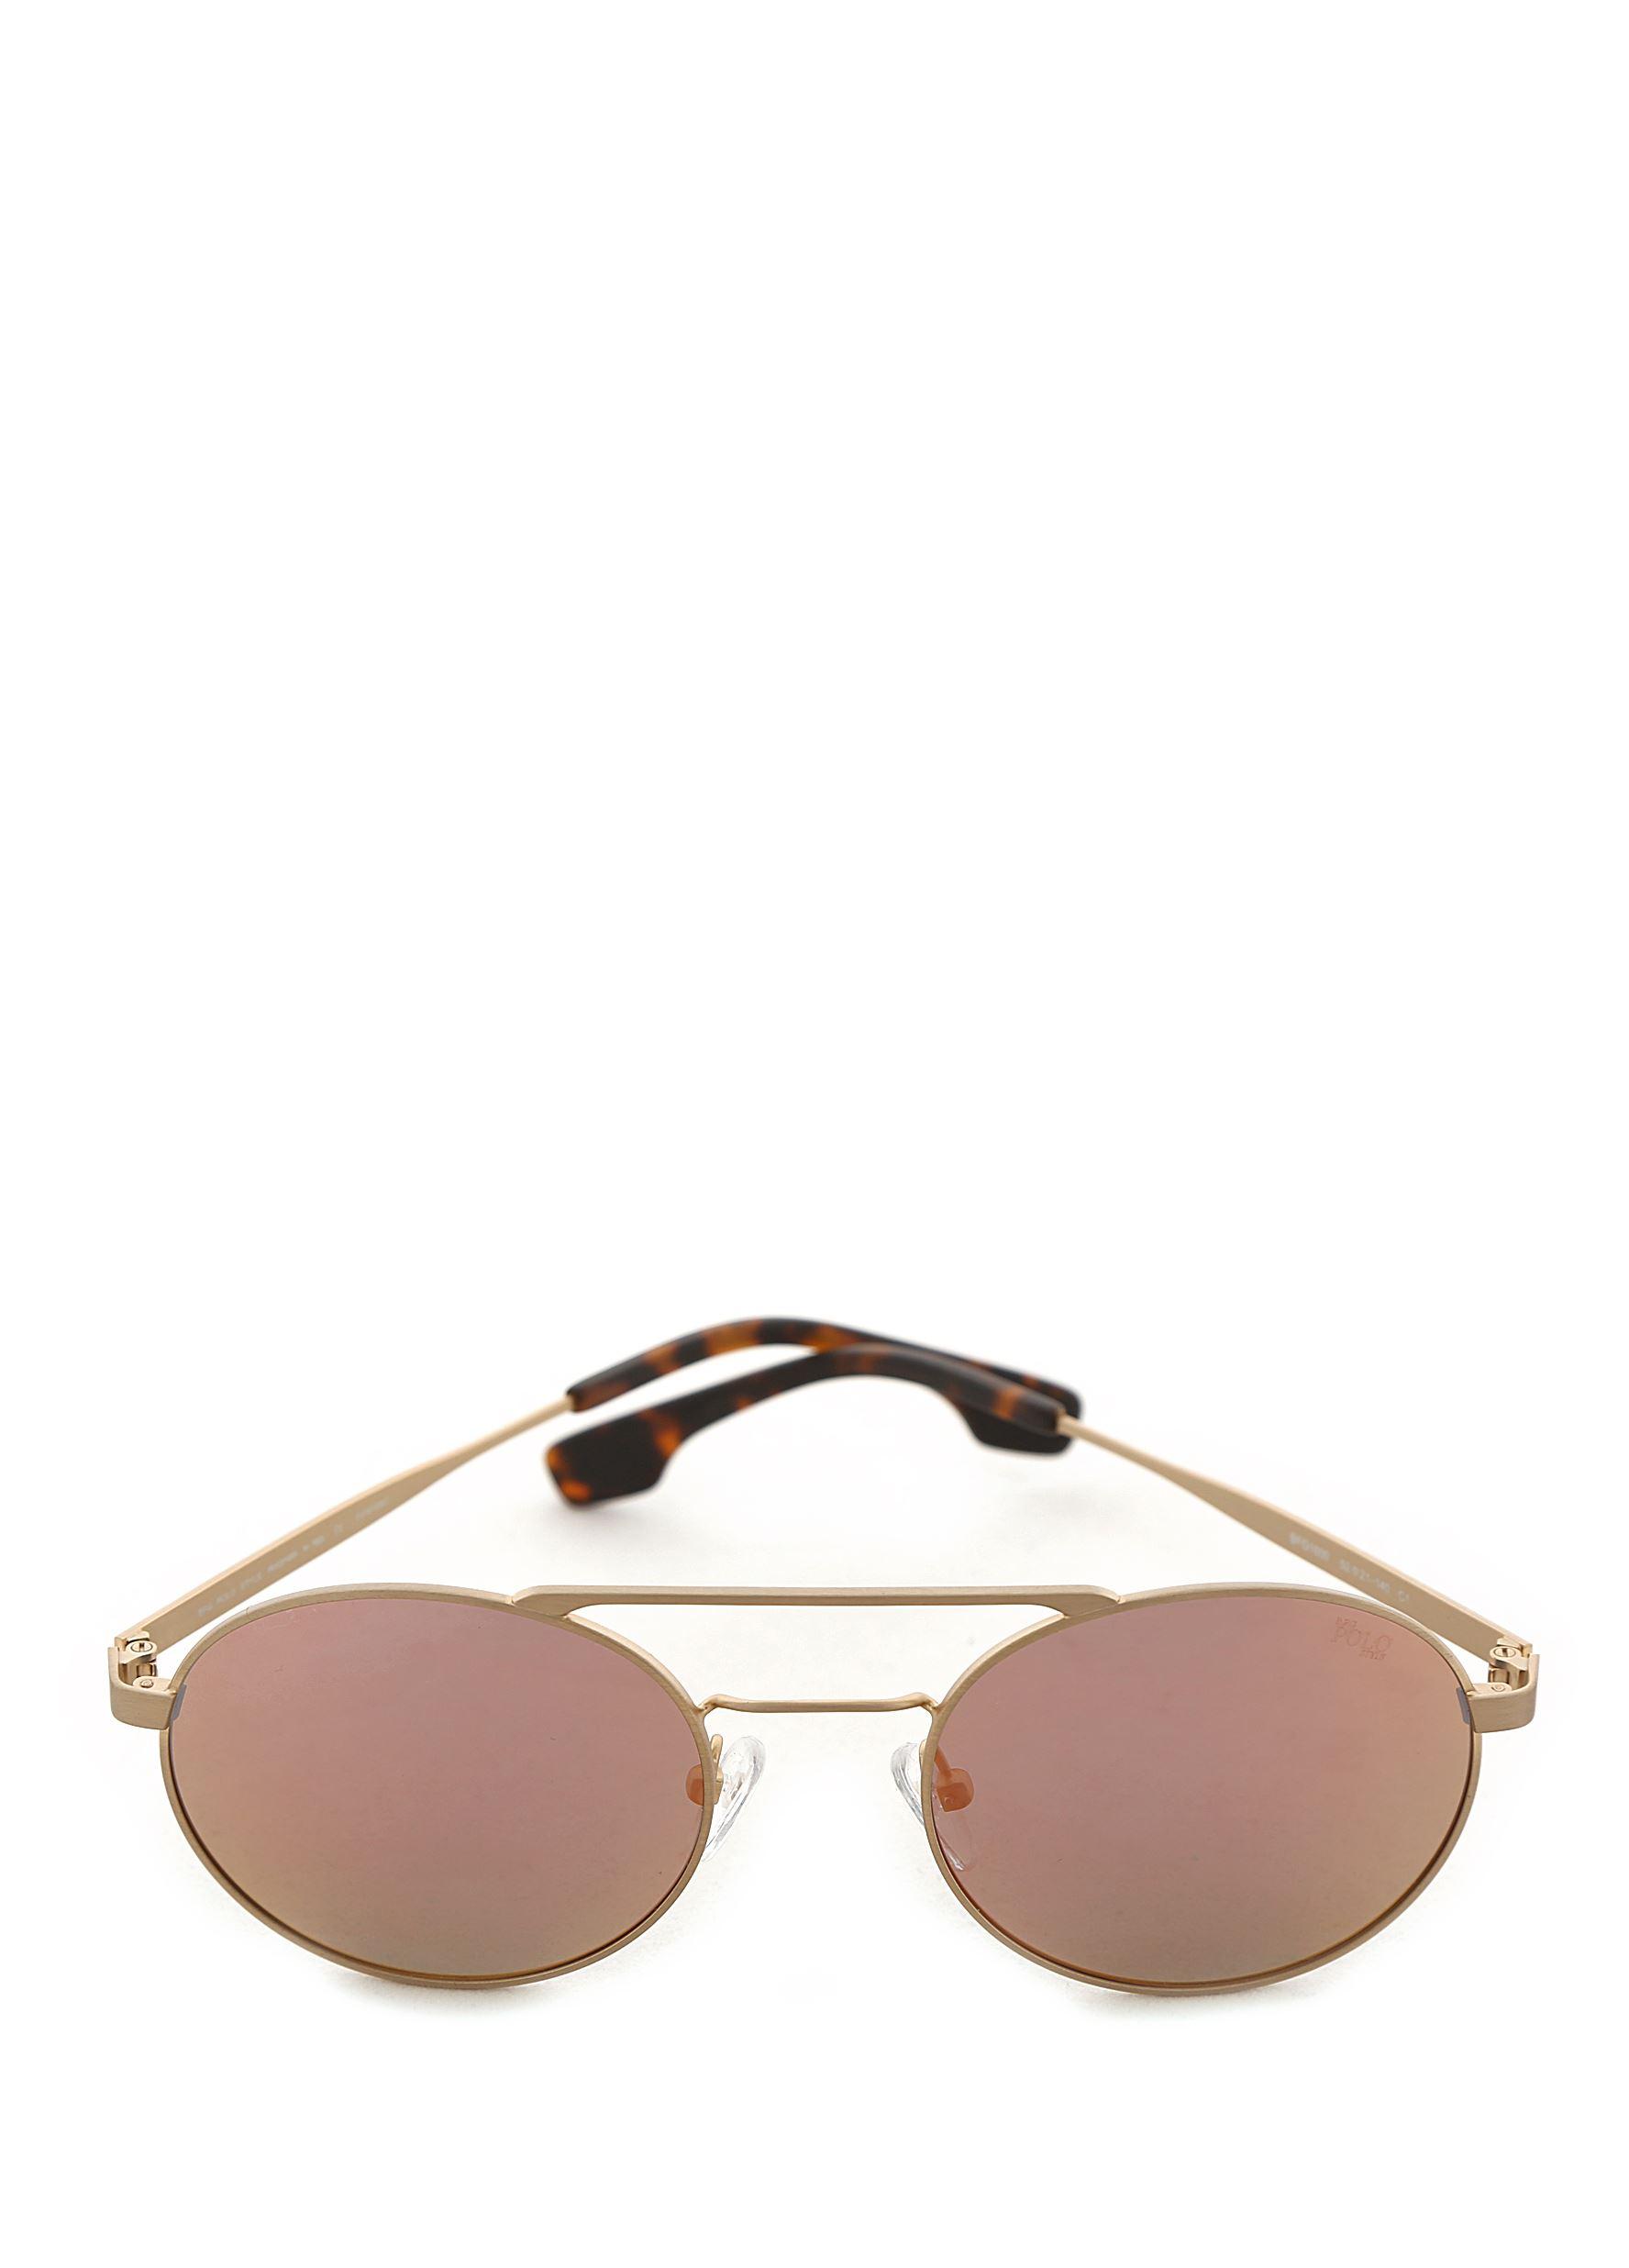 VQF Italia & More Sunglasses - Unisex Γυαλιά Ηλίου BFG POLO STYLE